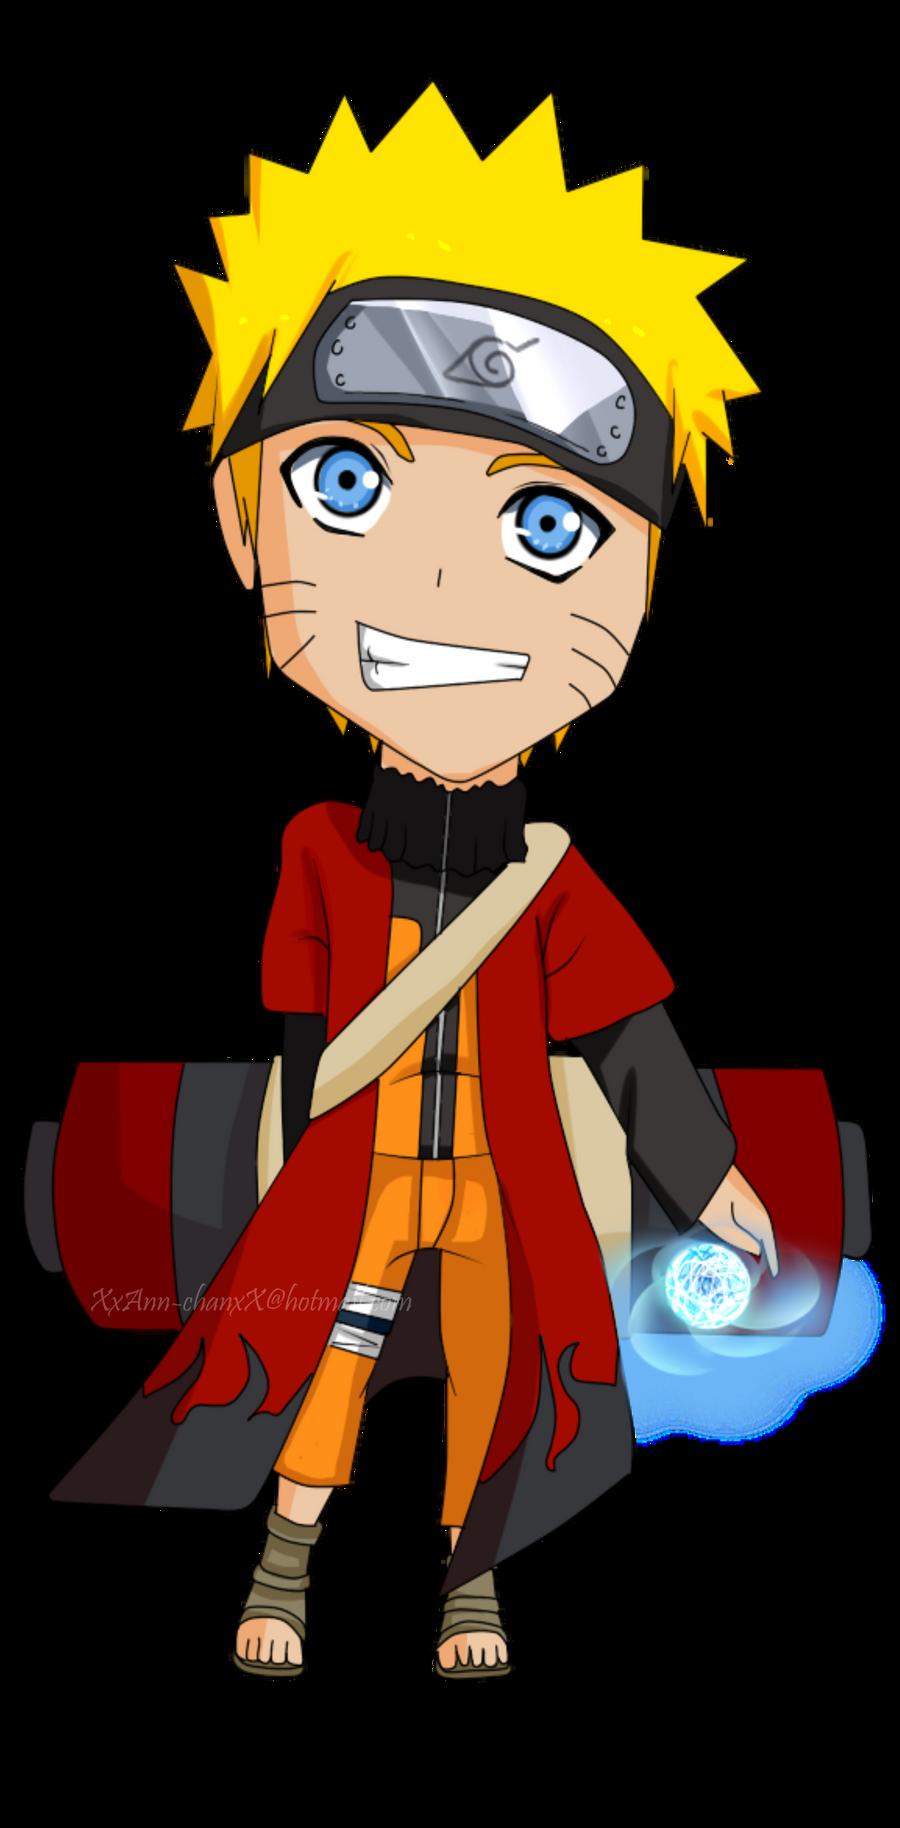 Chibi naruto uzumaki by doruporu on deviantart - Naruto chibi images ...